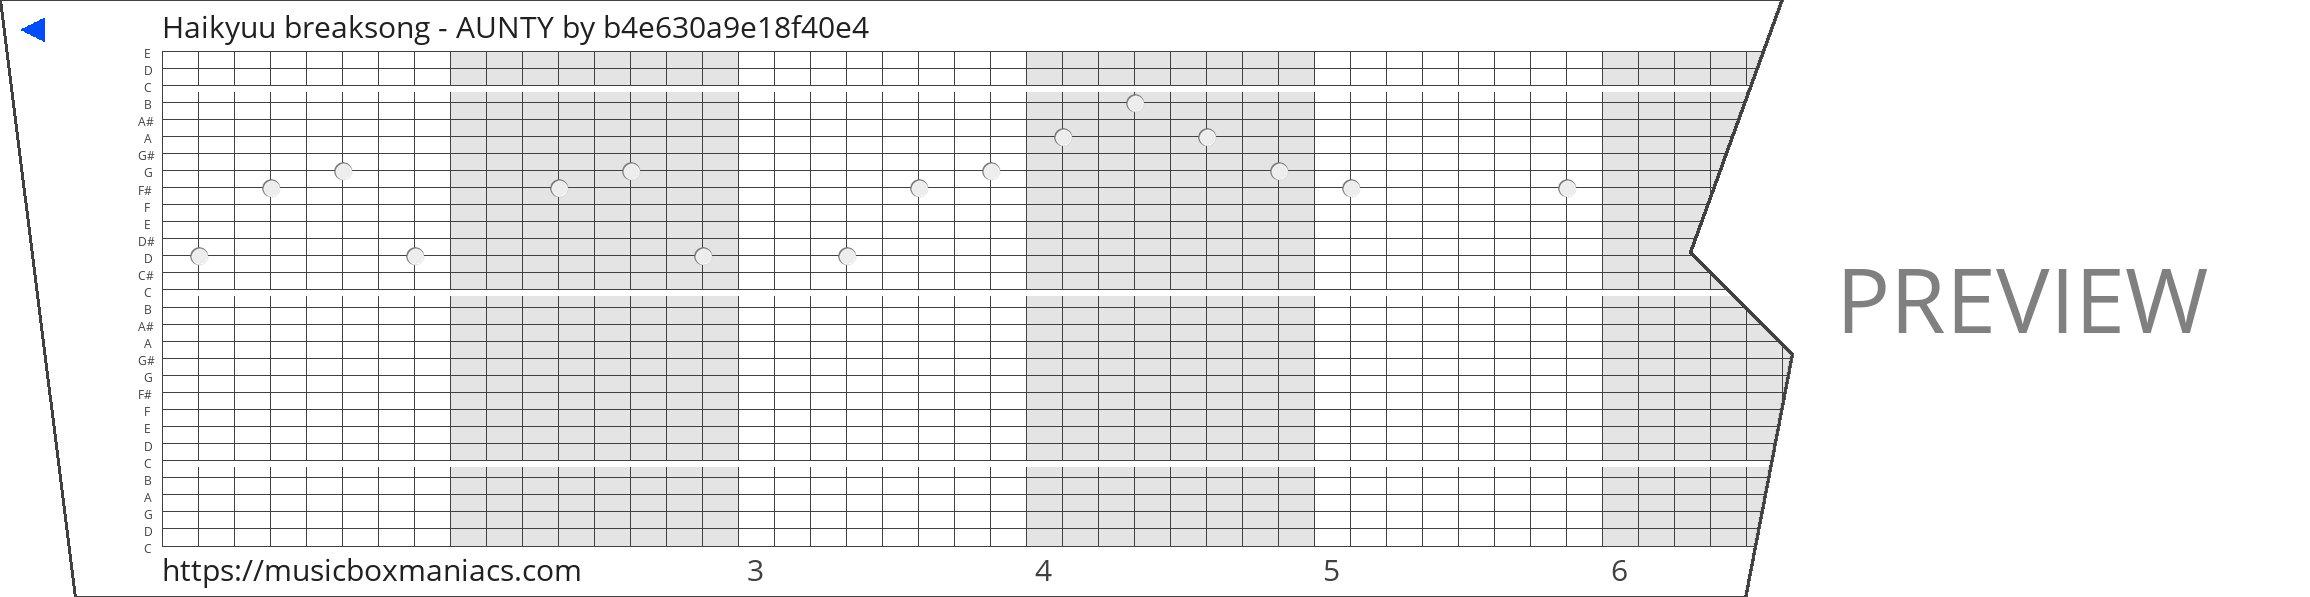 Haikyuu breaksong - AUNTY 30 note music box paper strip